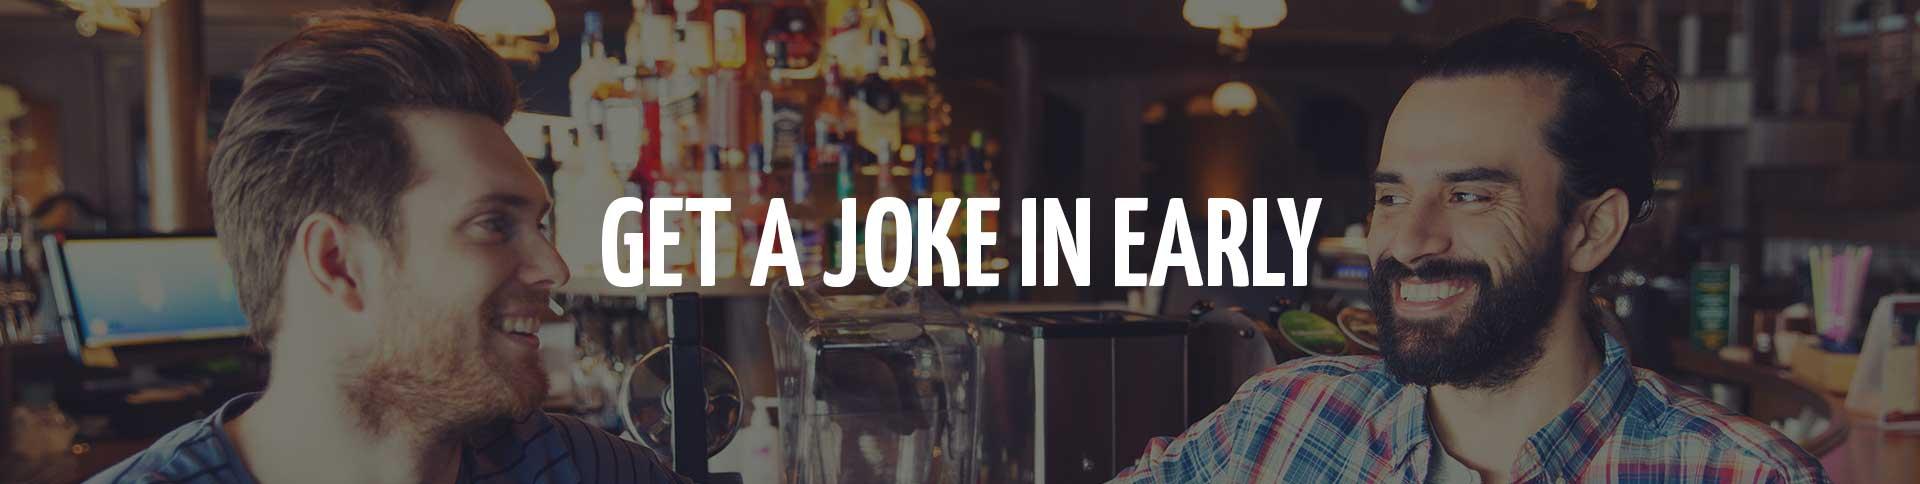 best man speech jokes